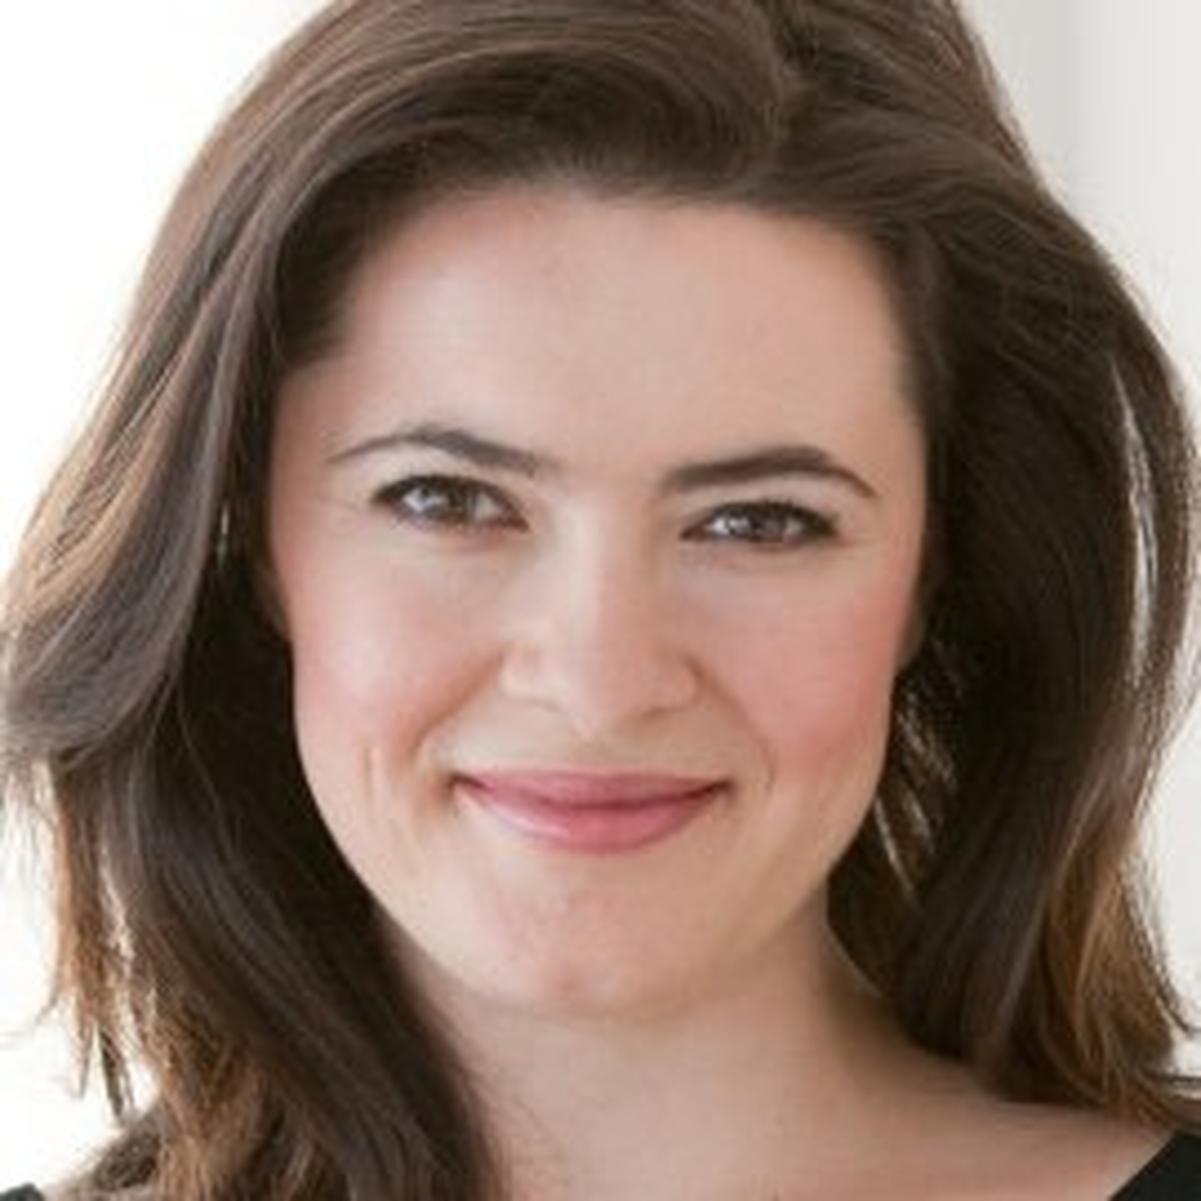 Tara Sophia Mohr